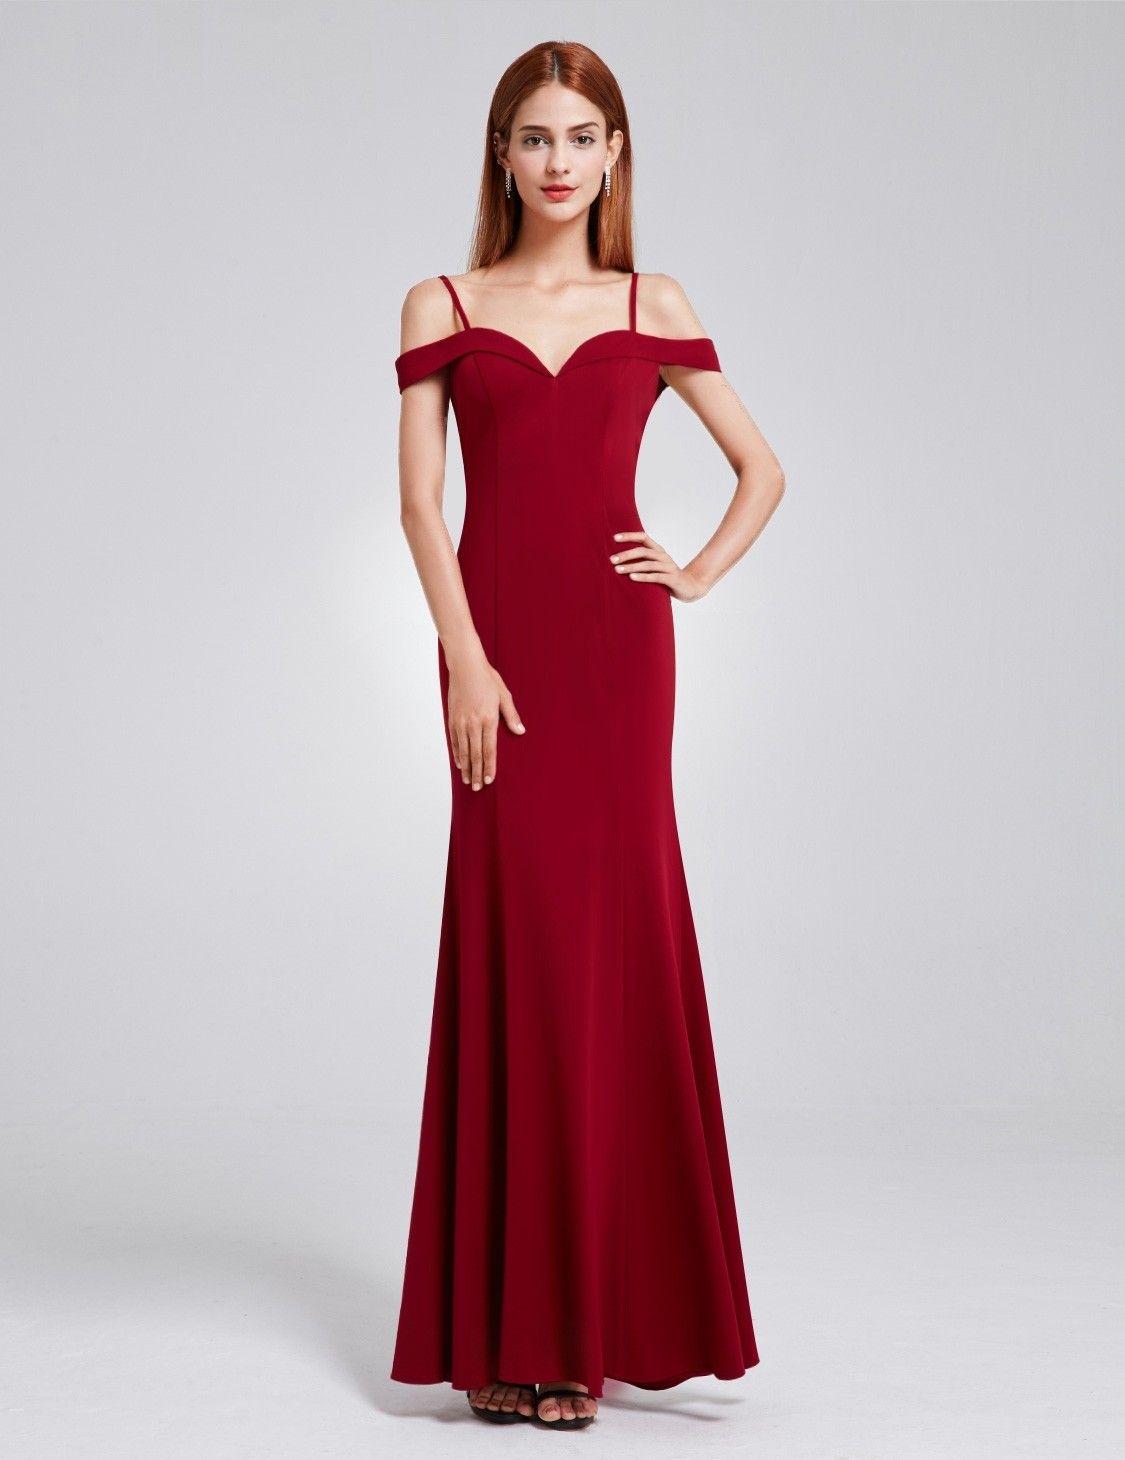 OfftheShoulder Sweetheart Neckline Dress Burgundy